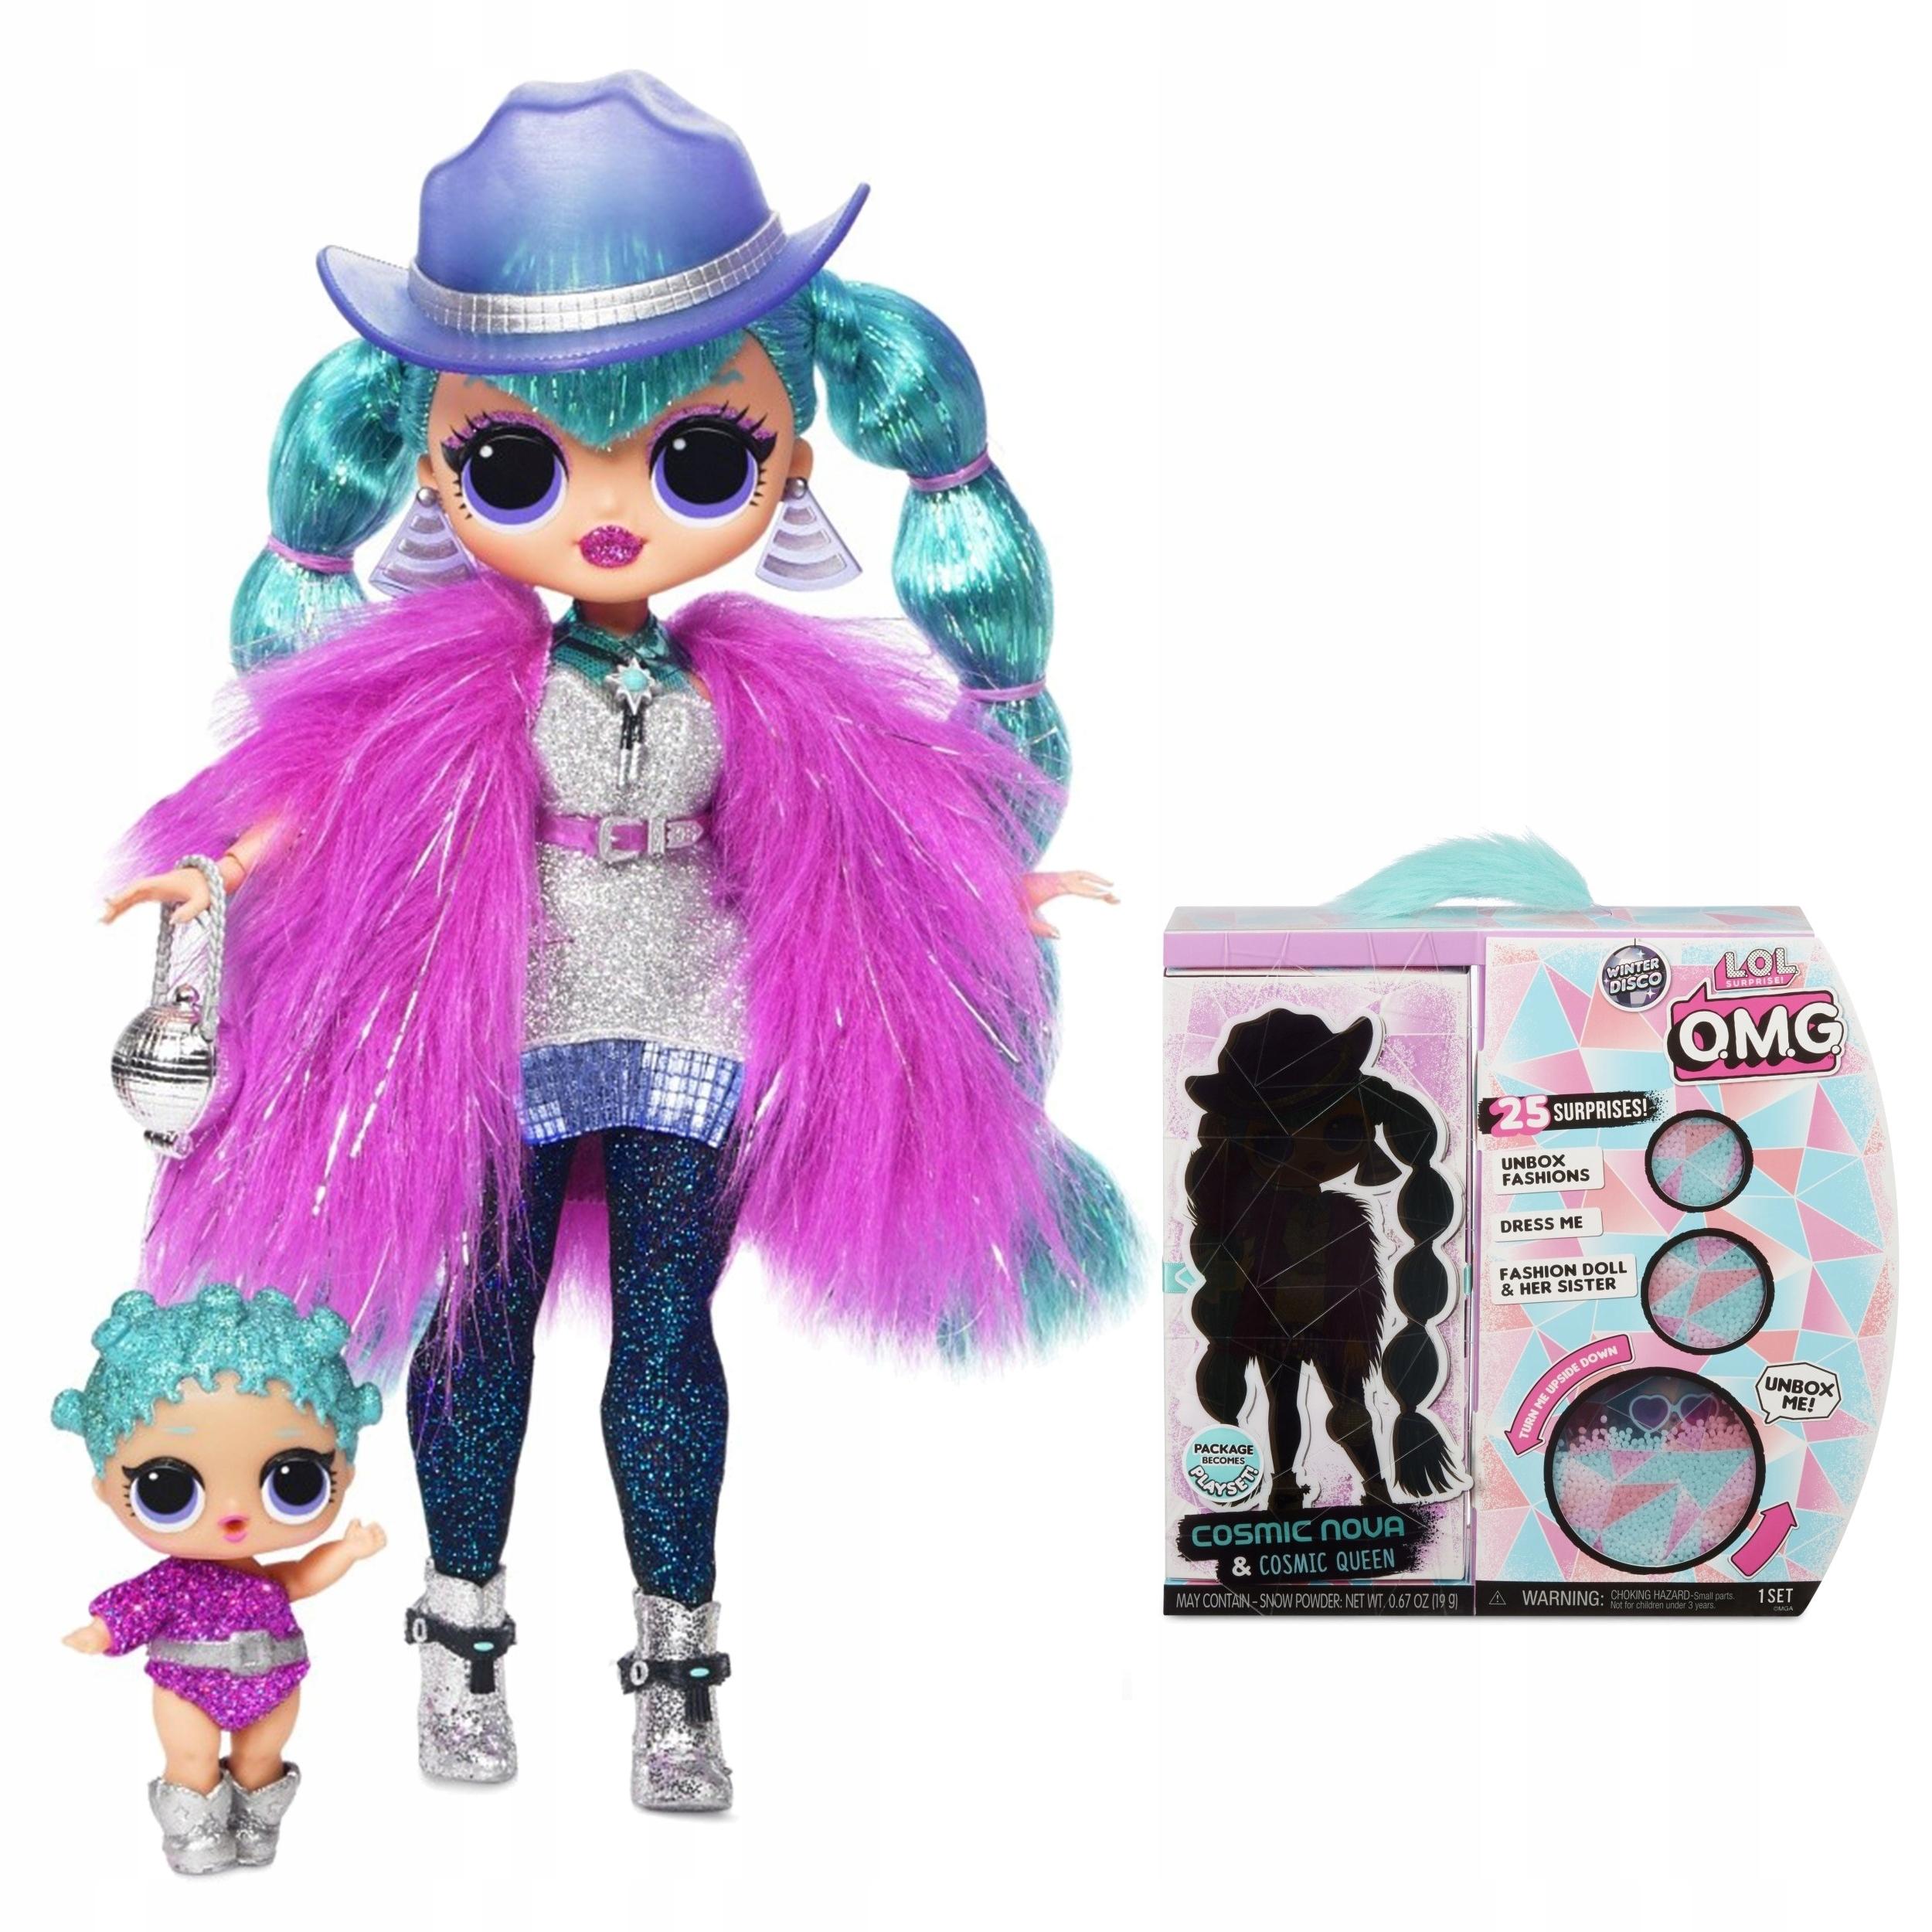 Prekvapujúca bábika LOL! OMG Winter Disco Cosmic Nova